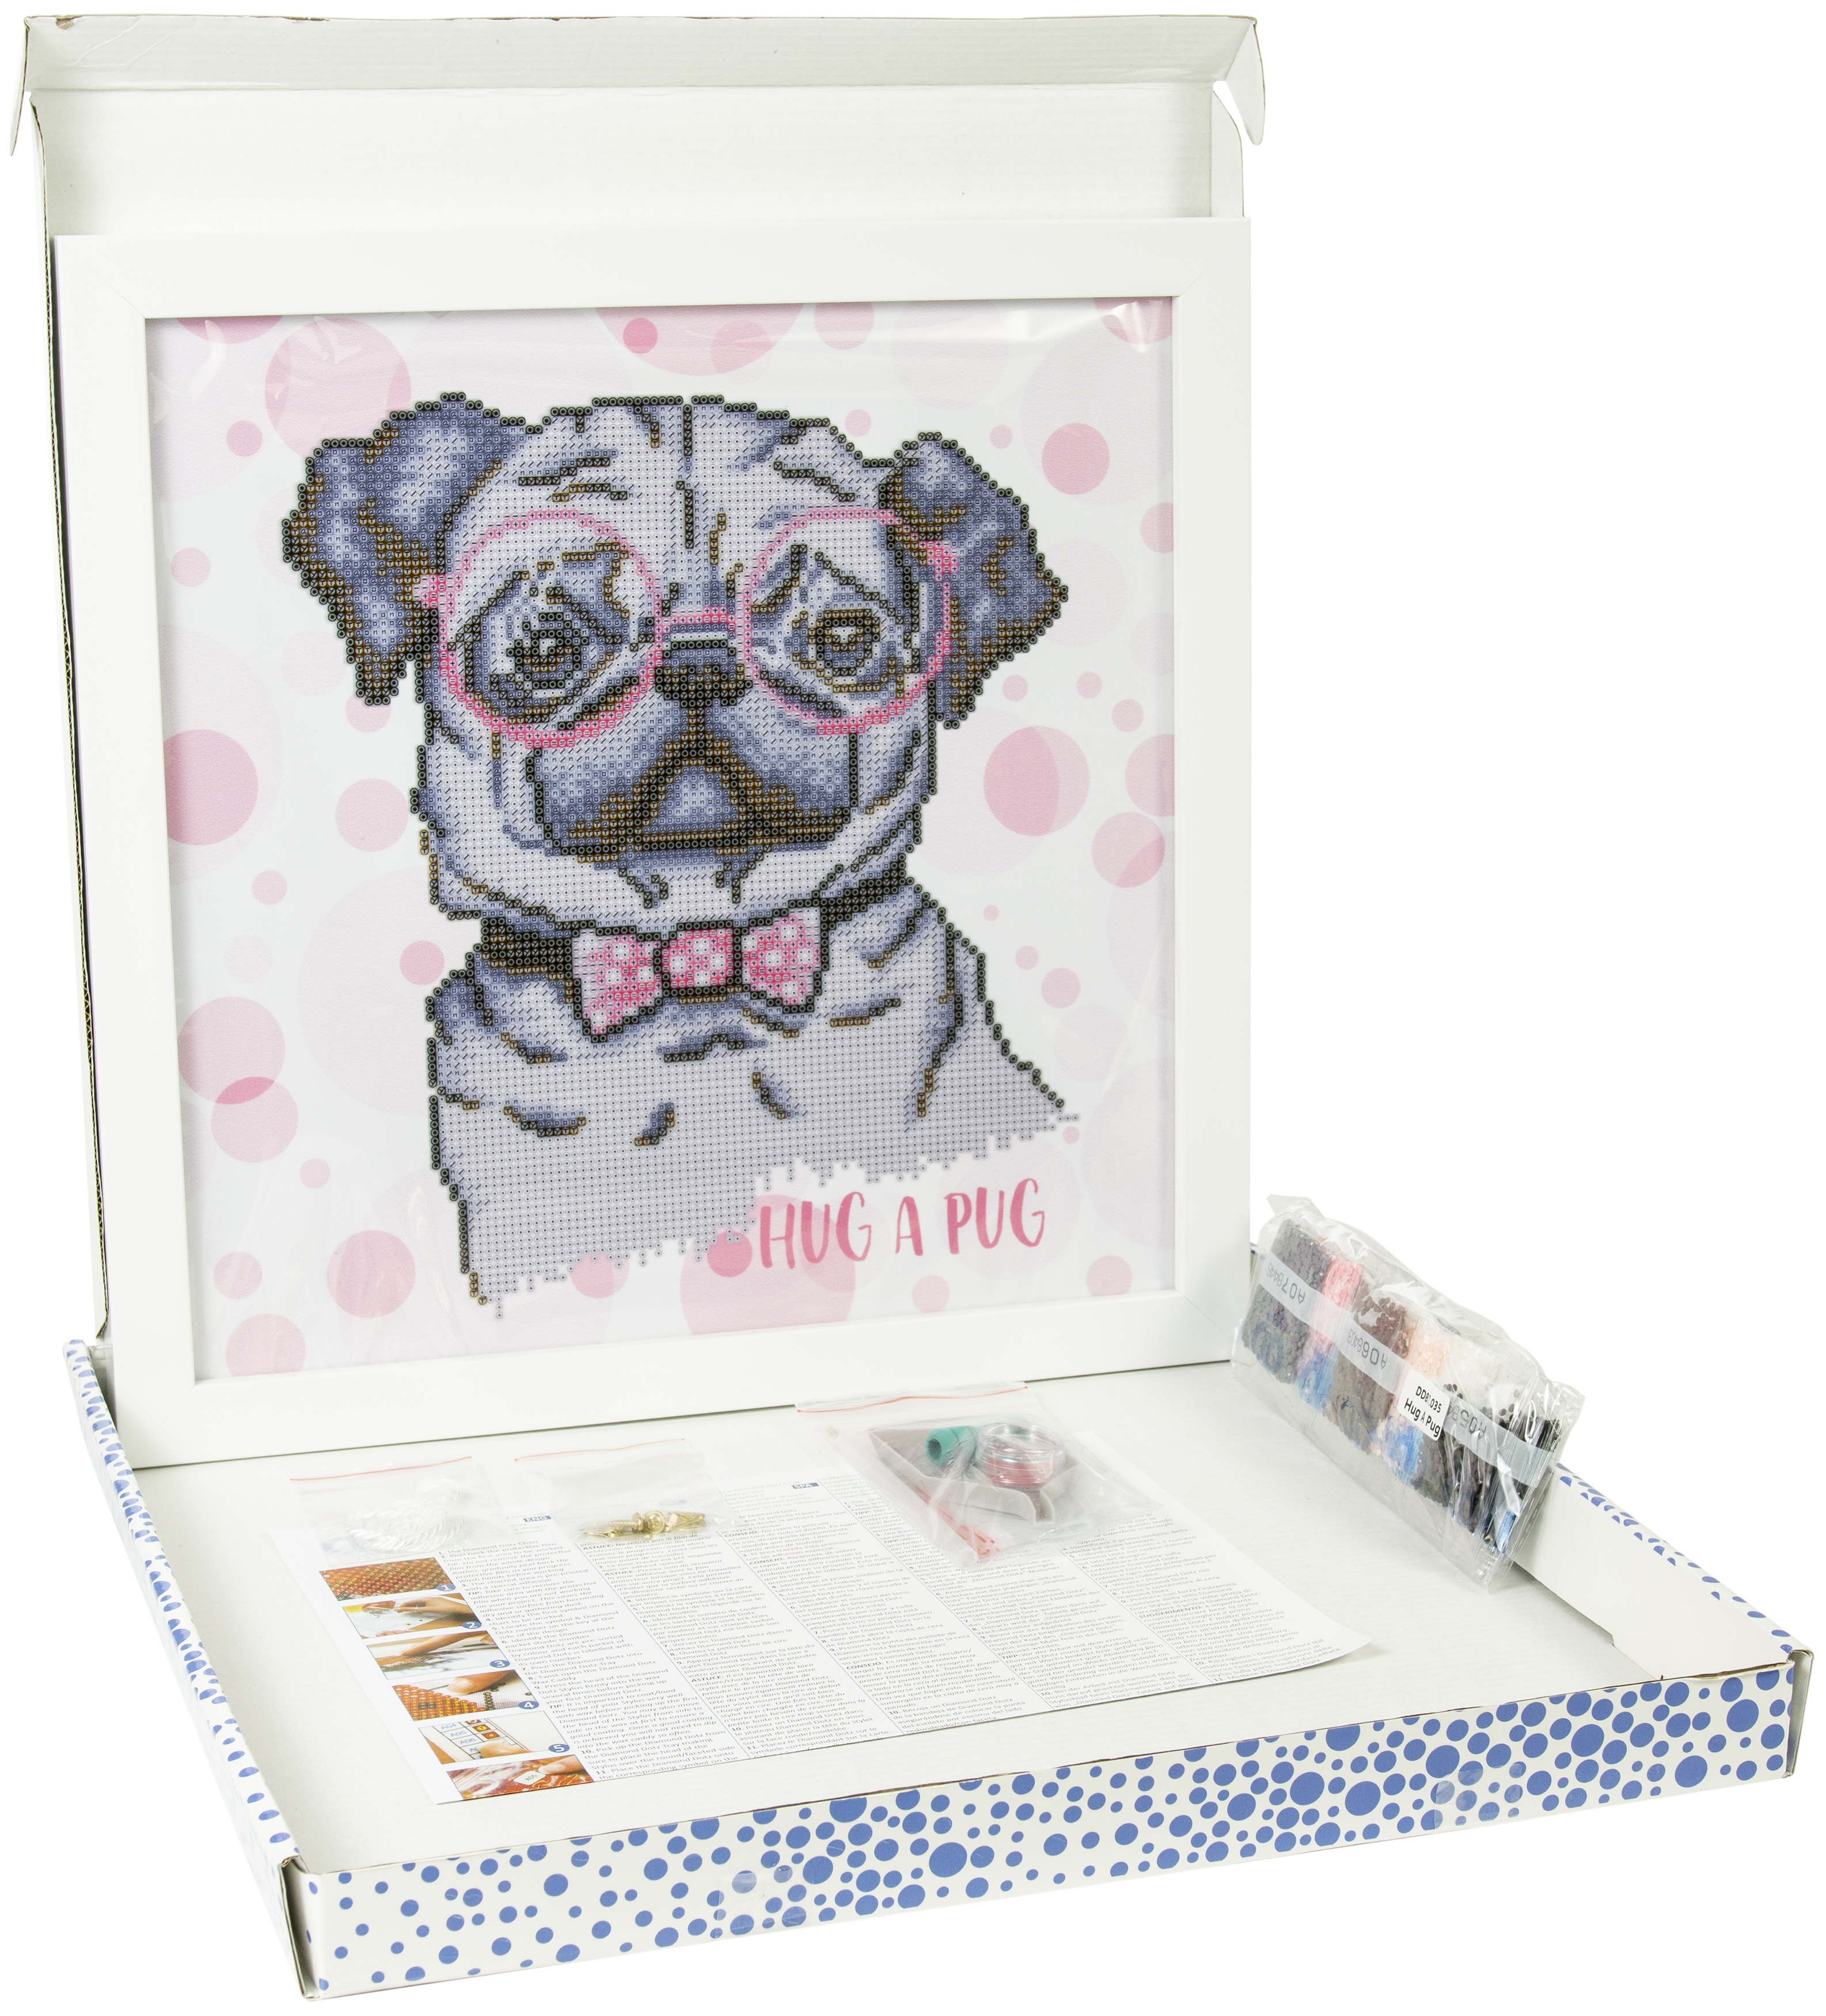 Diamond Dotz Diamond Embroidery Facet Art Kit W/ Frame-Hug A Pug